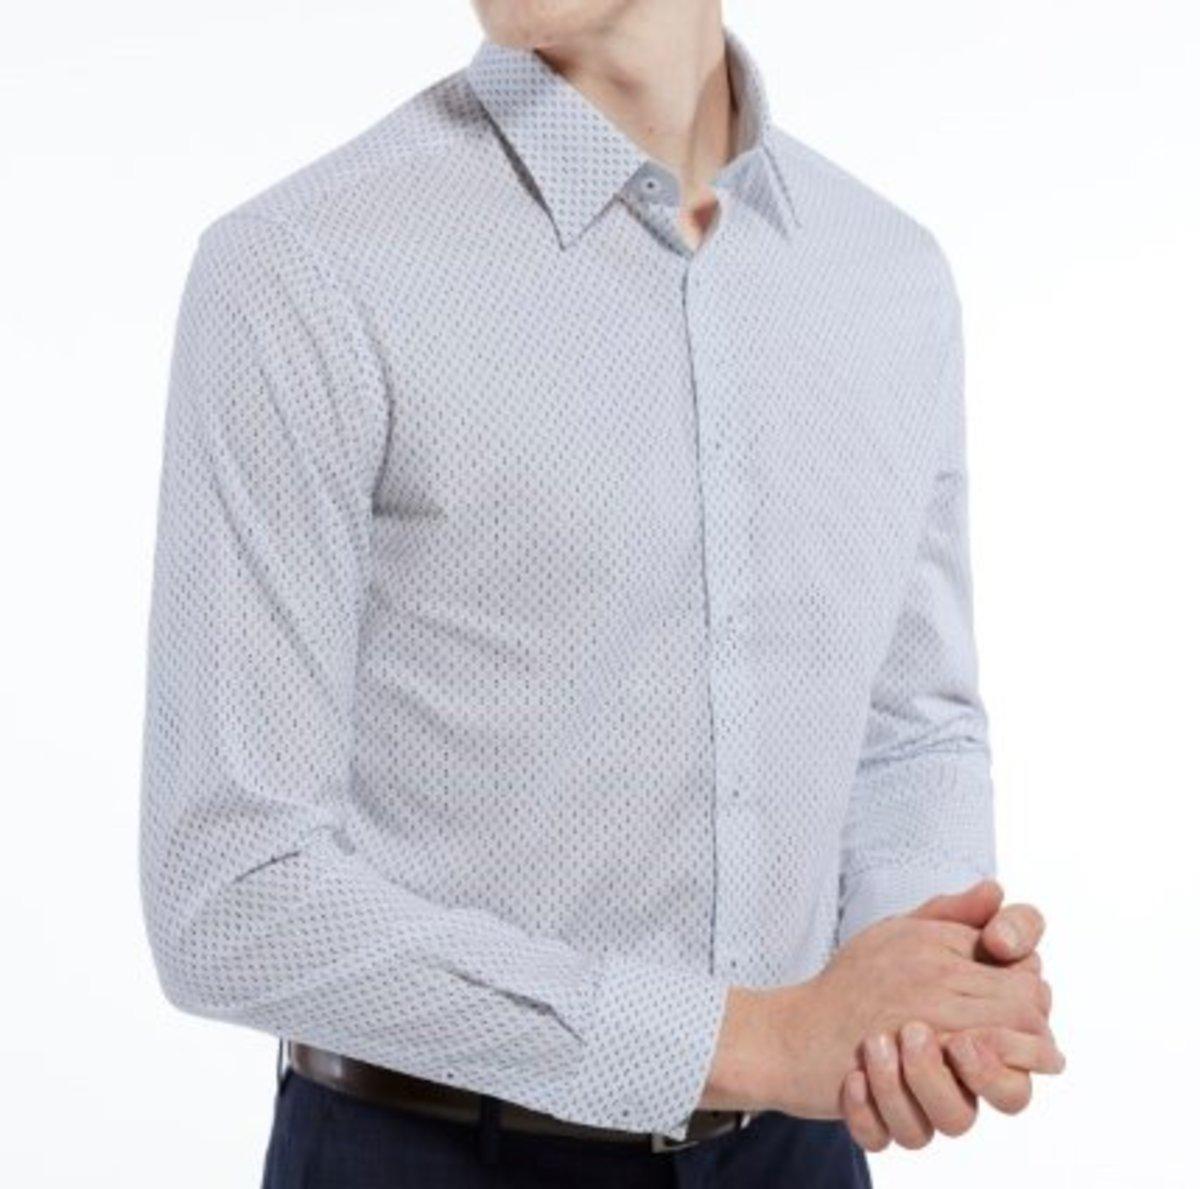 Men's Fine Cotton Long Sleeve Shirt (White)